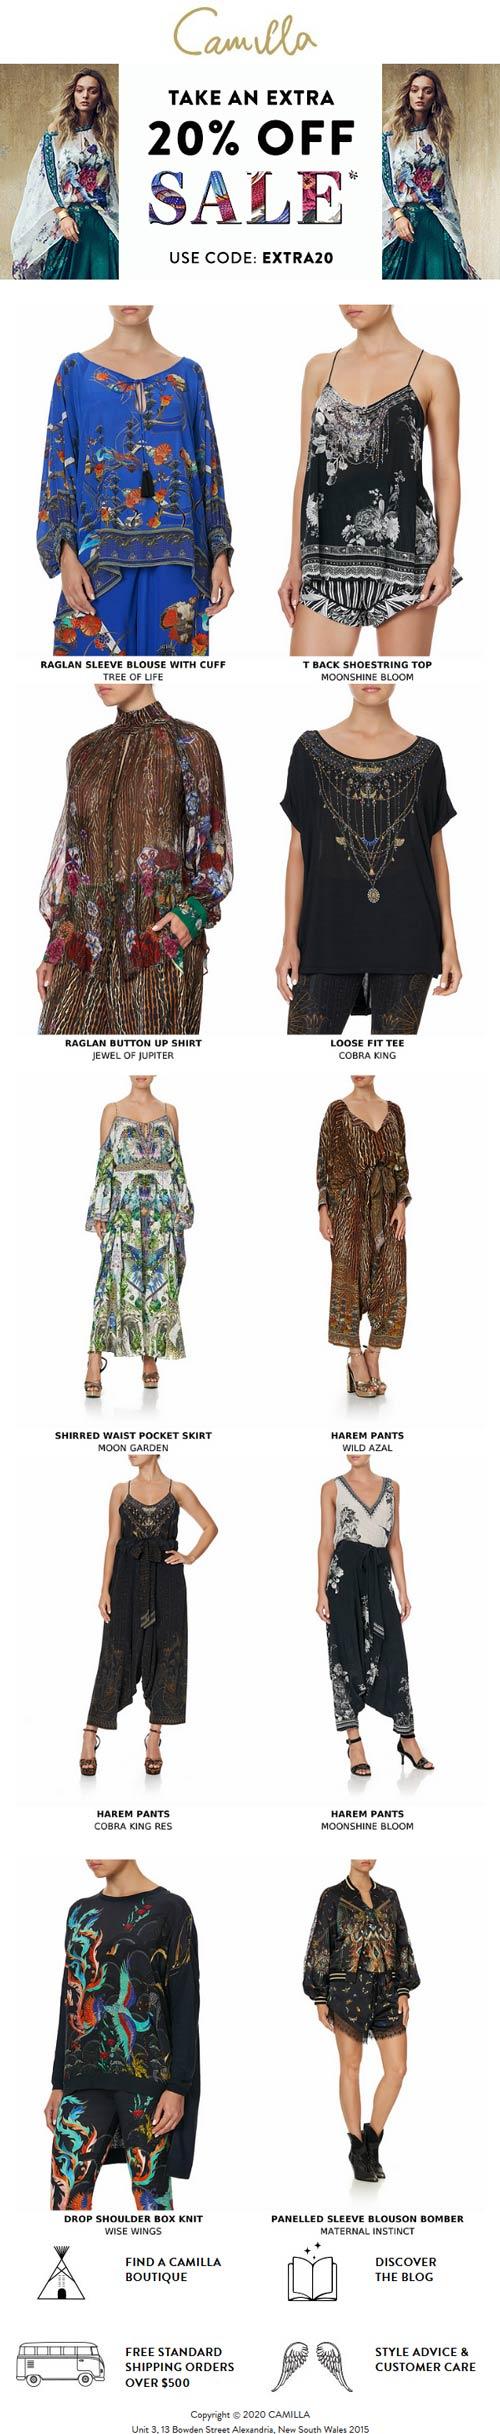 Extra 20% off sale items at Camilla via promo code EXTRA20 #camilla